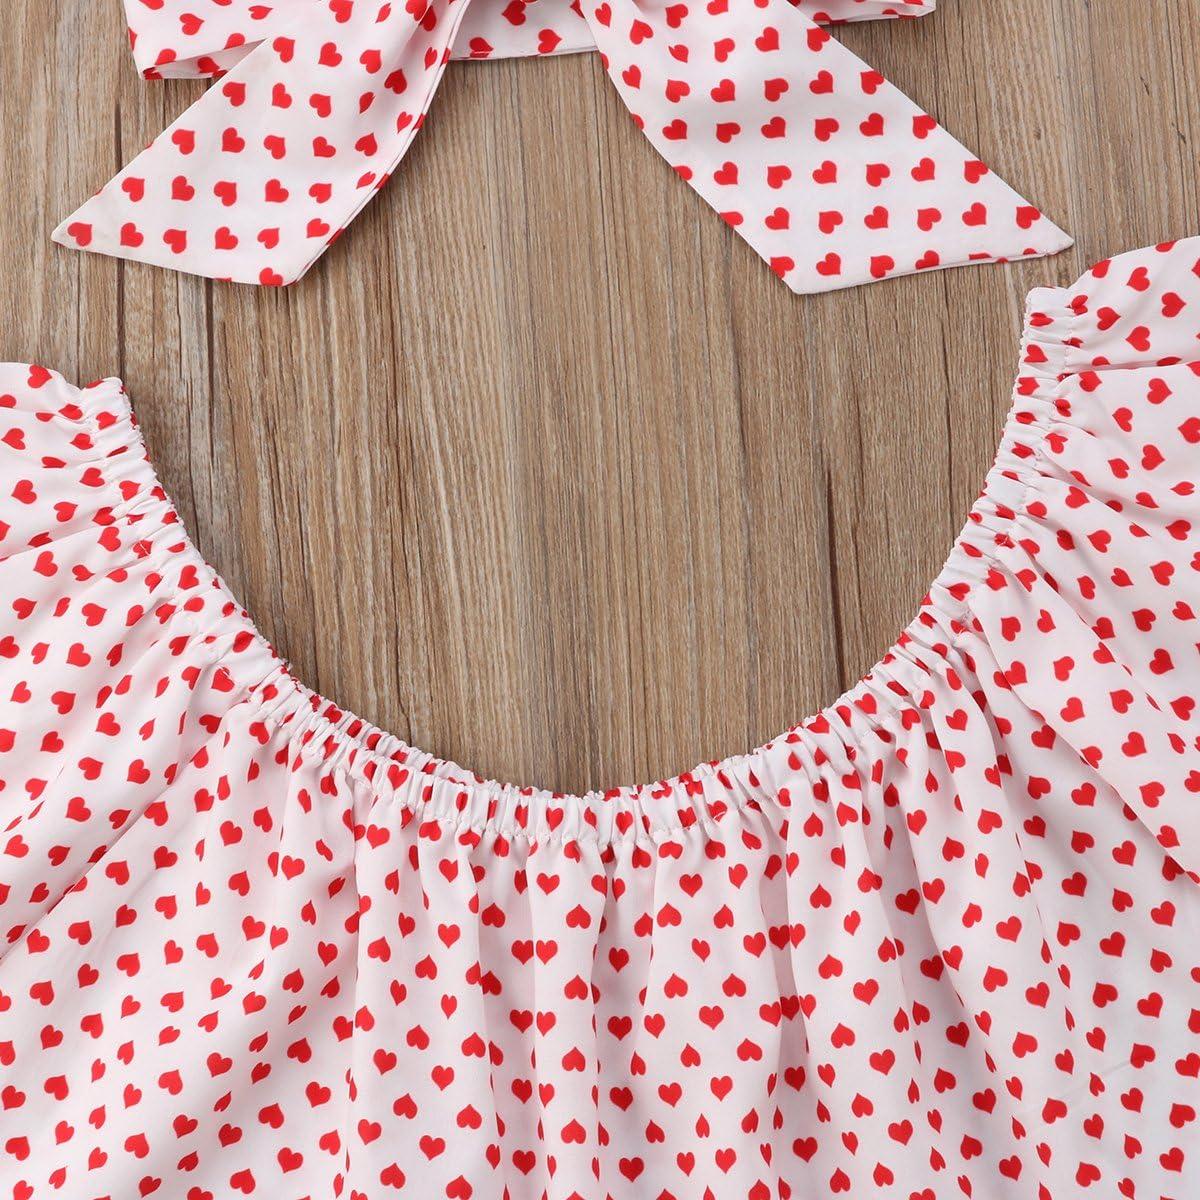 Newborn Baby Girls Love Printed Off Shoulder Top Shorts Headband 3 Pcs Outfit Set